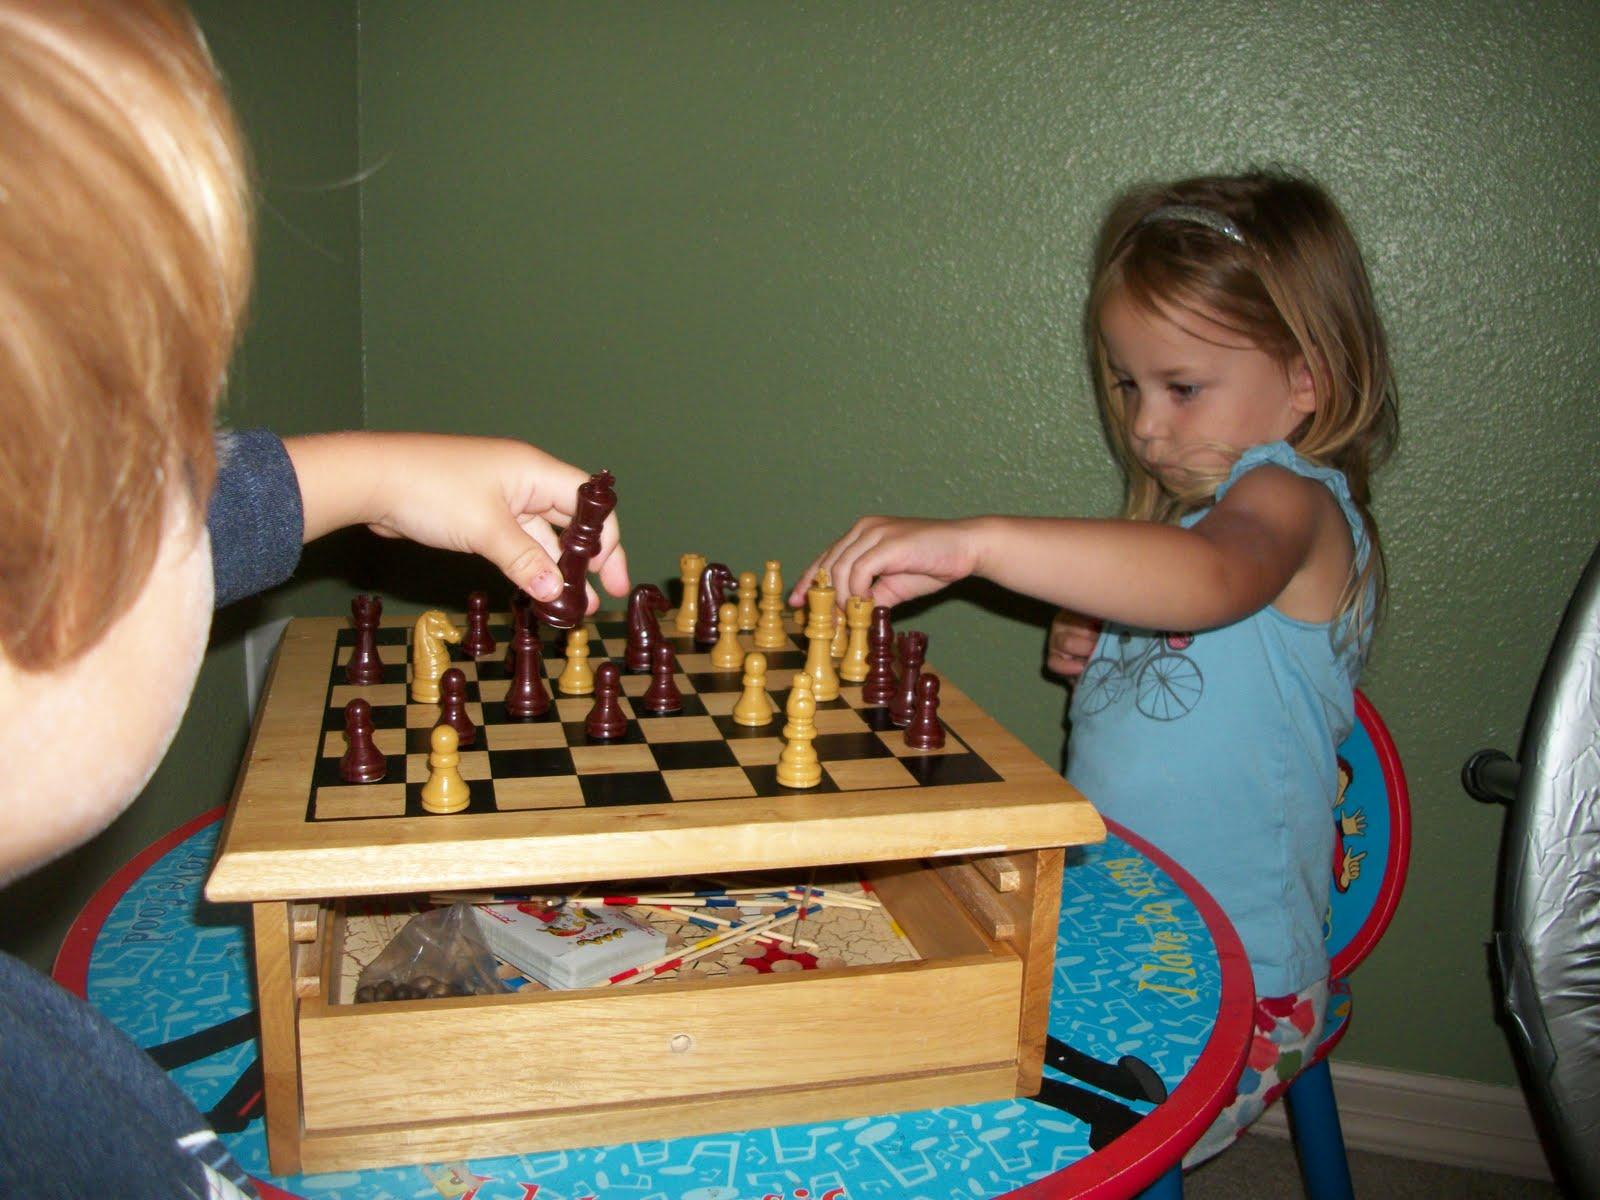 LaVidaFranco: Chess anyone??